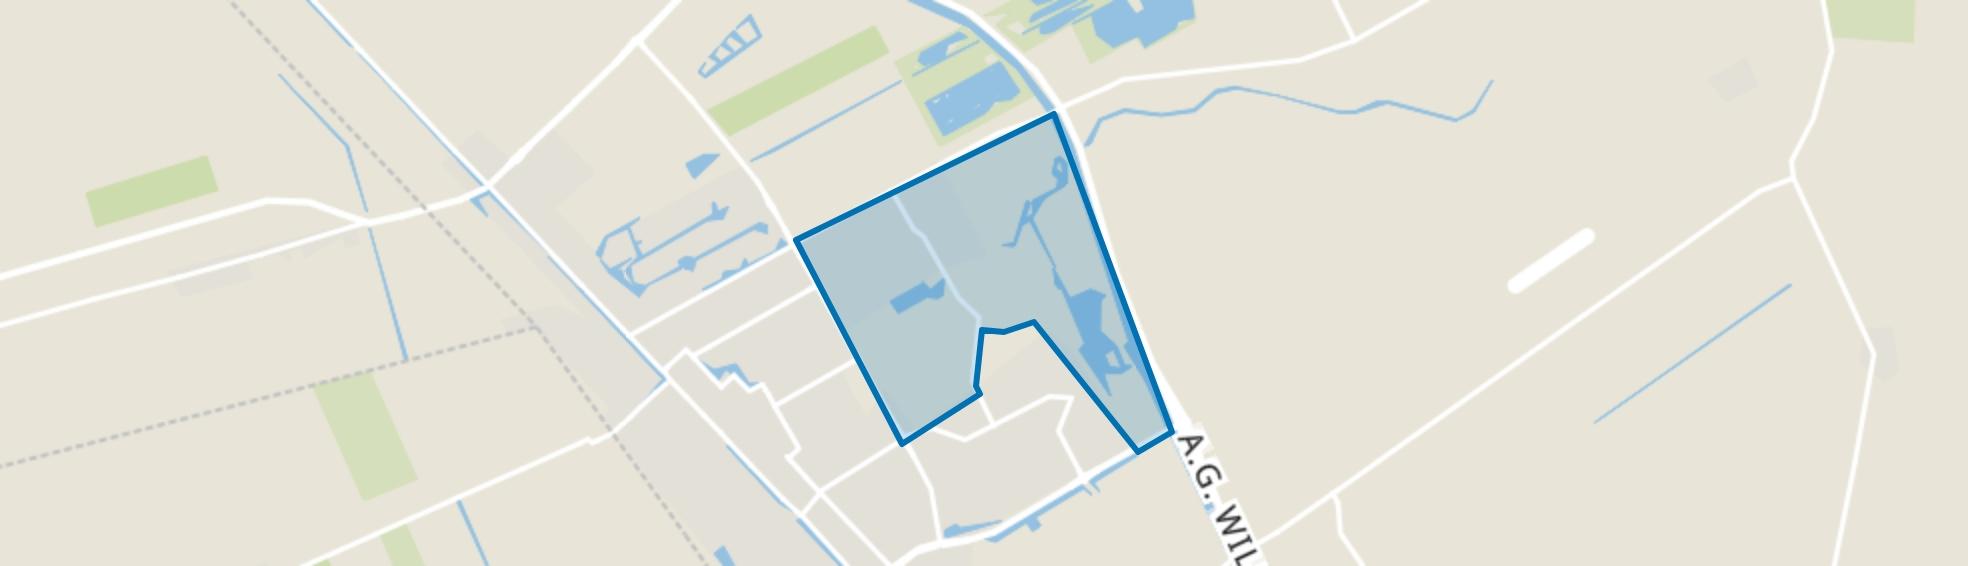 Maarsveld, Stadskanaal map